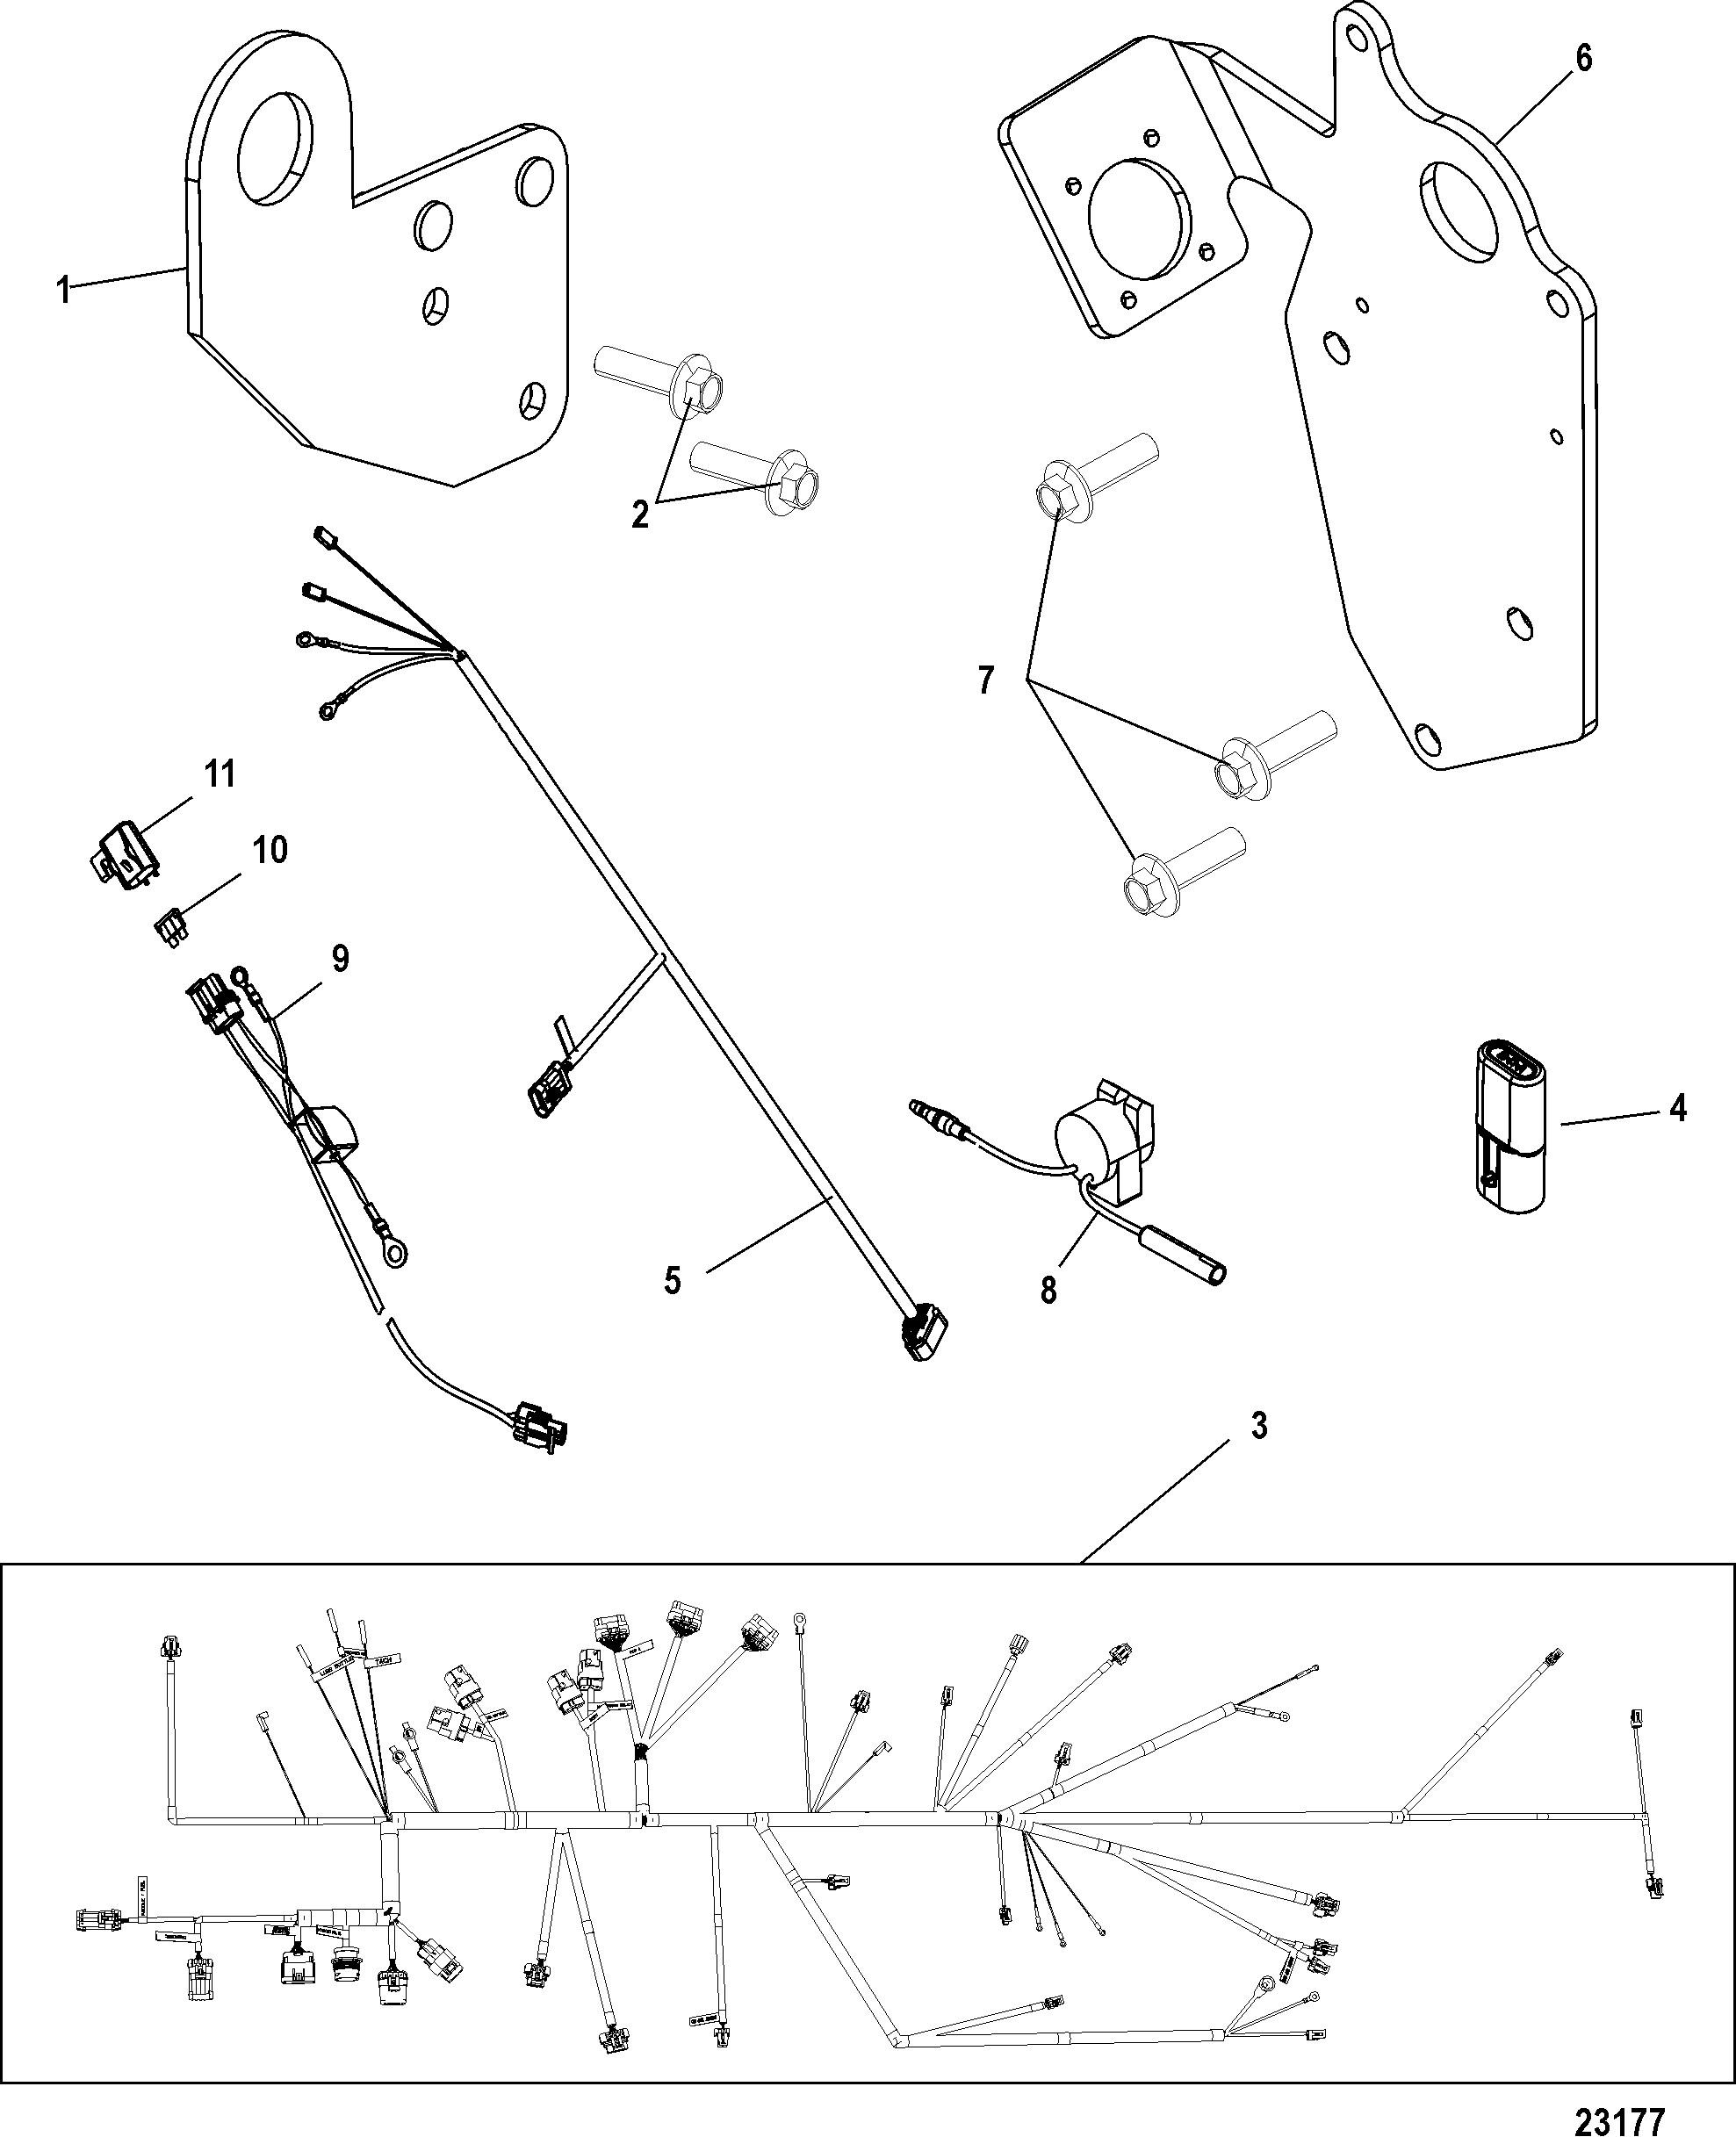 Mercury Outboard Engine Diagram Carburetor Wmc 9 10 11 12